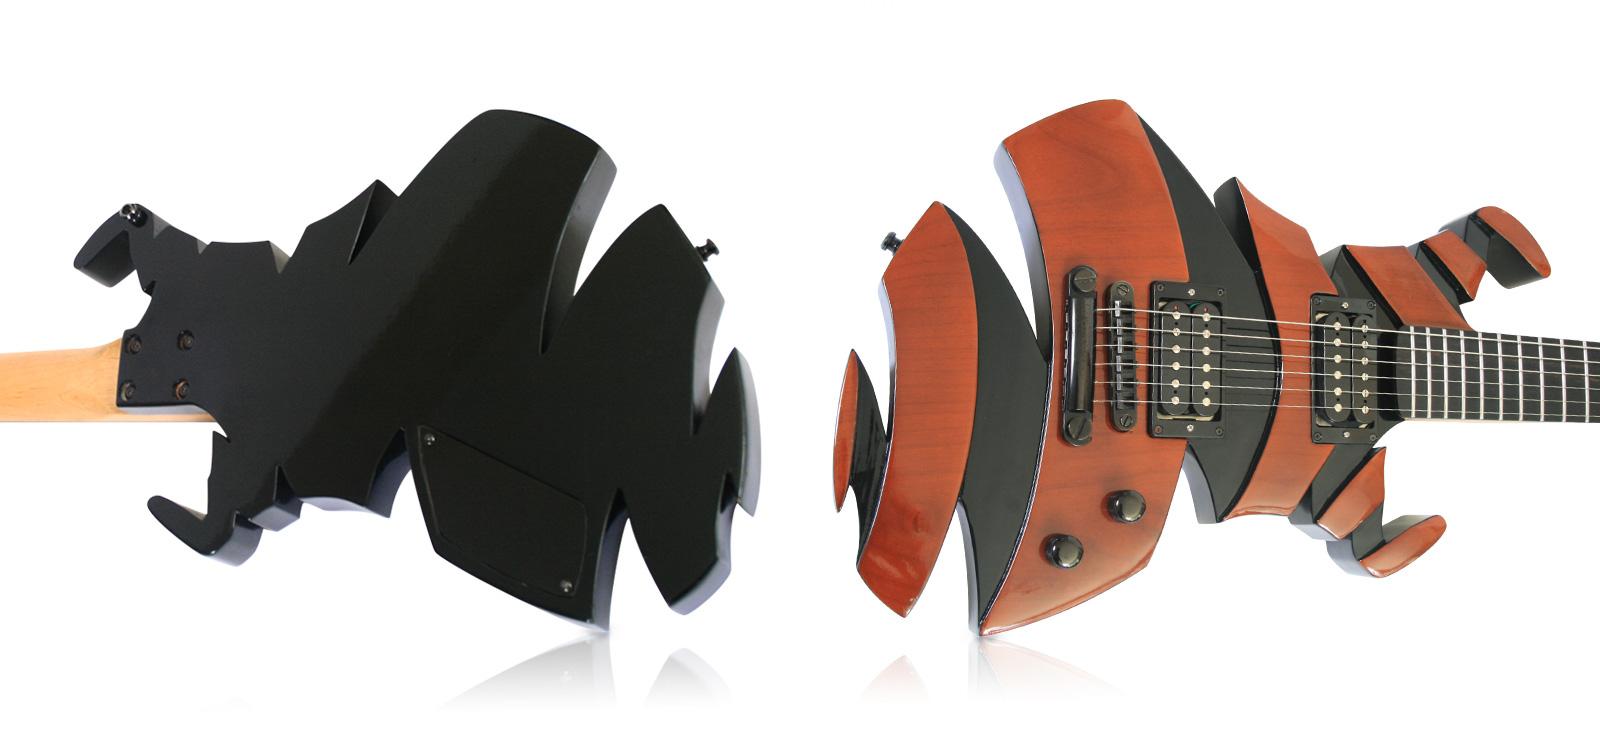 Helix hand made guitar